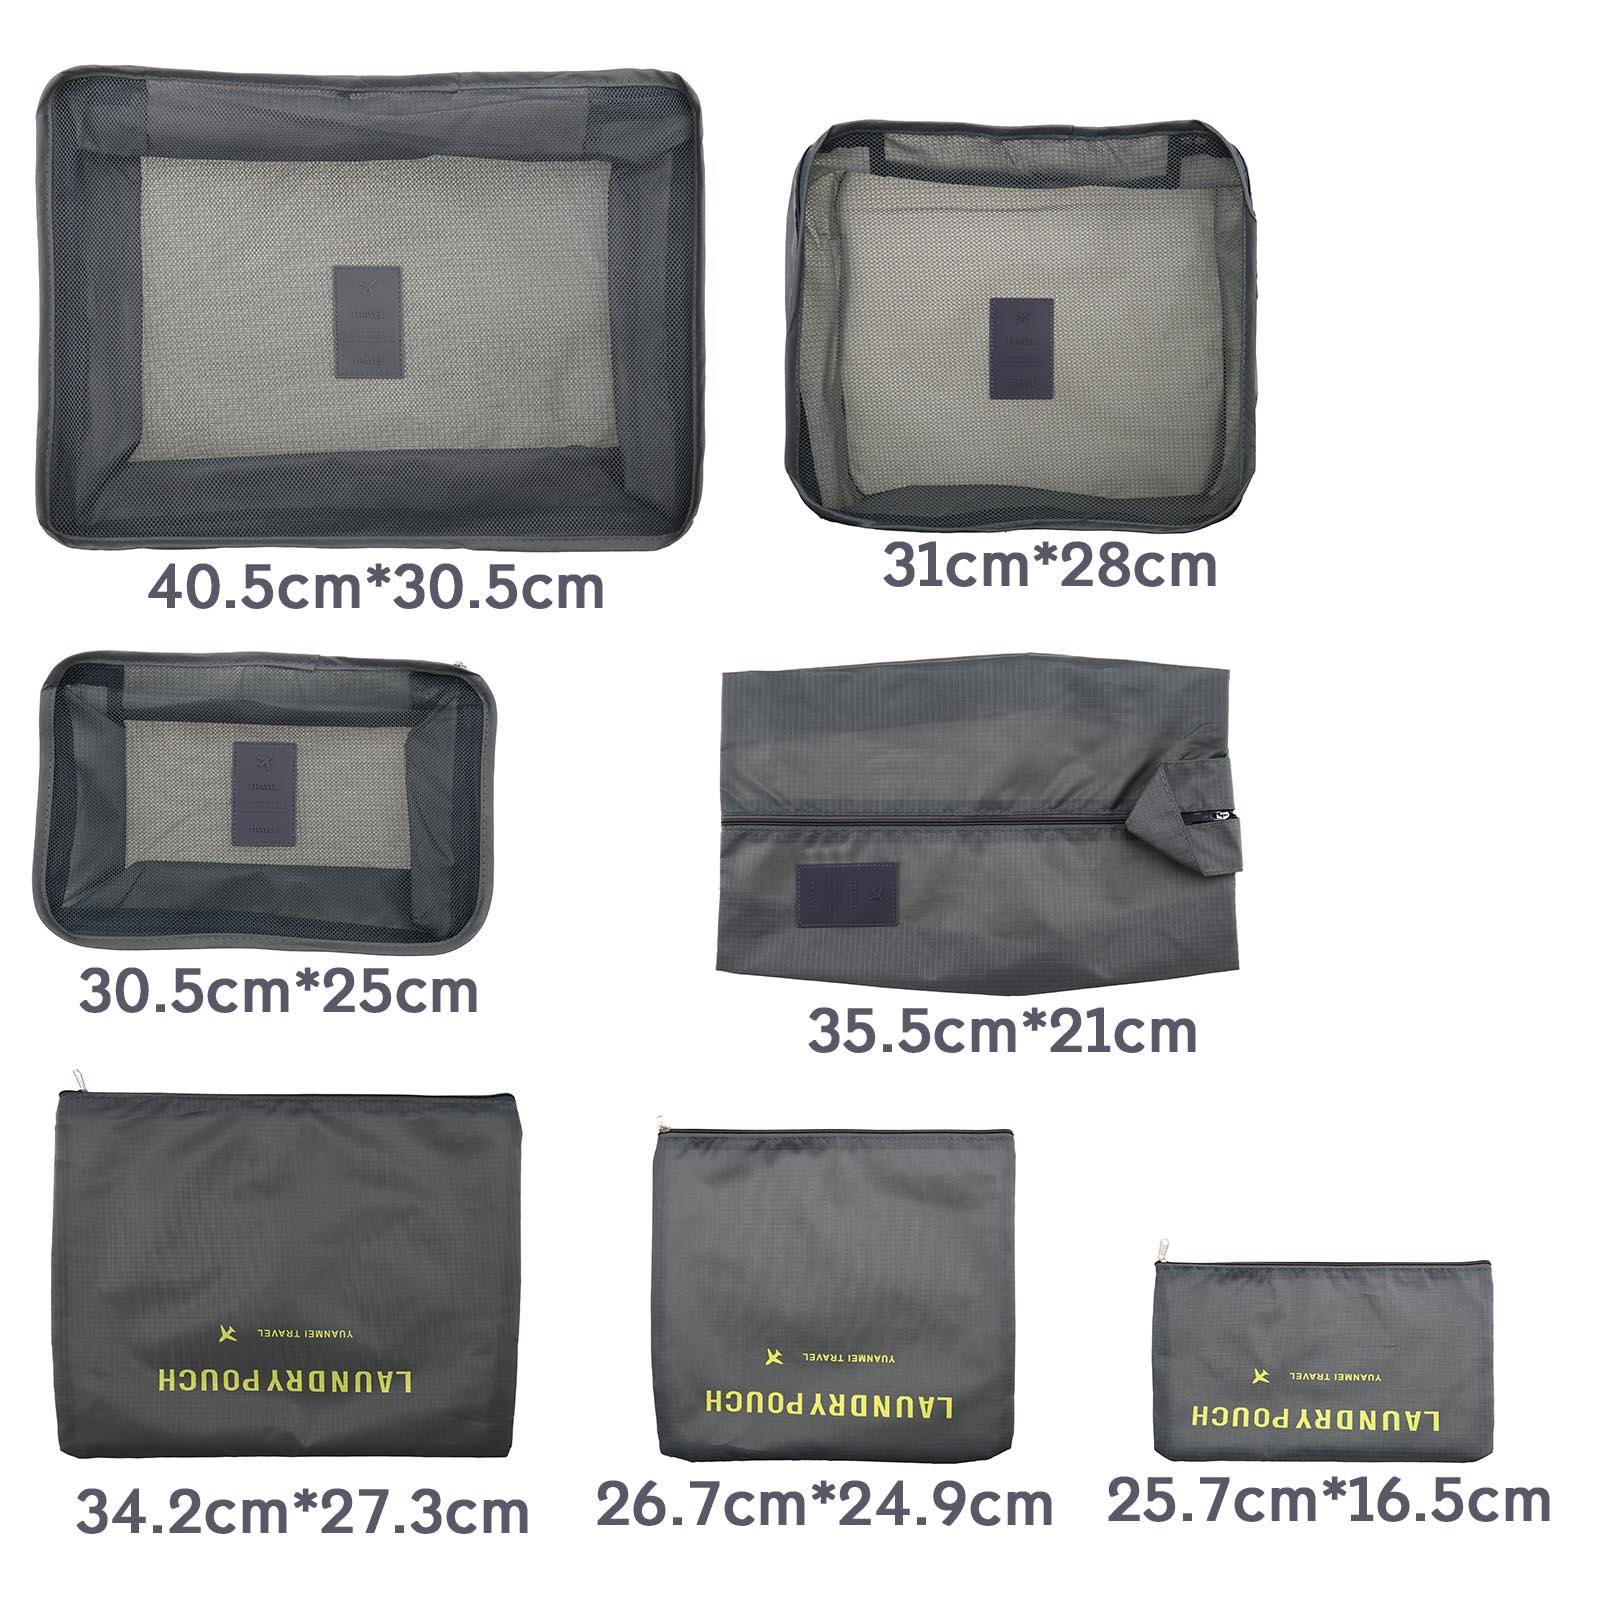 Portable Luggage Storage Bag Organizer Clothes Packing Bag Travelling Bag WT